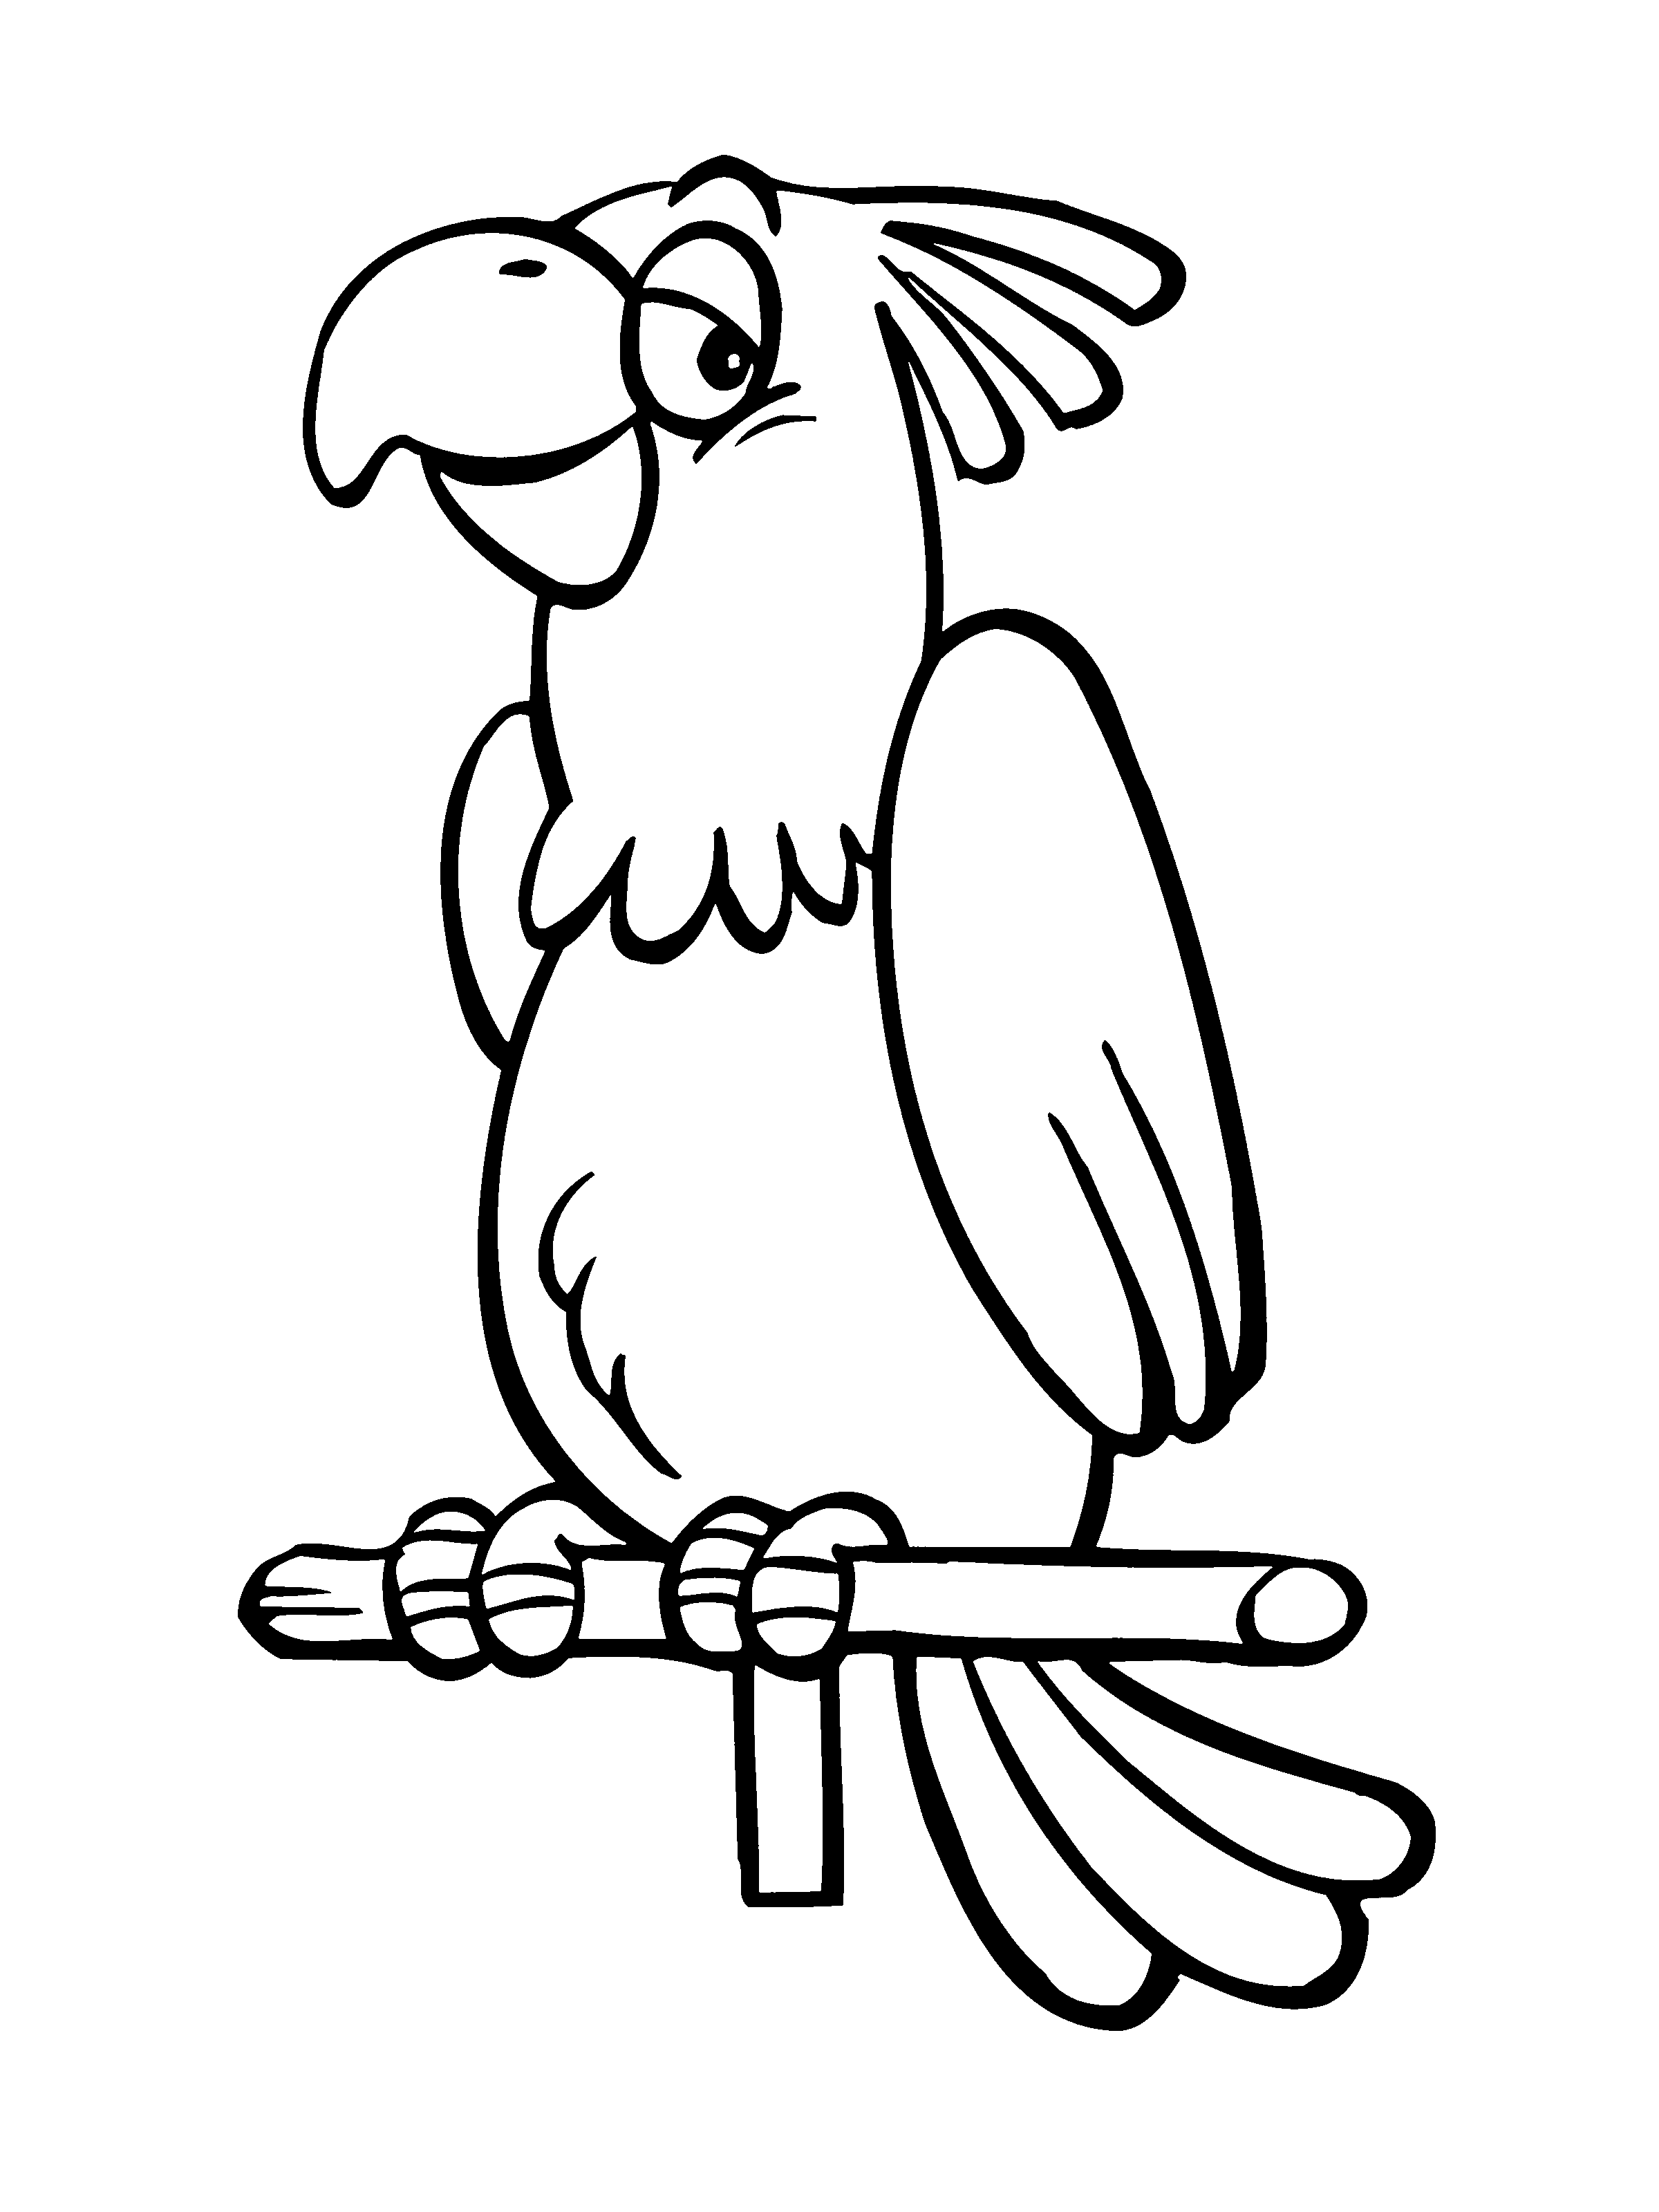 papegaai | Piratas | Pinterest | Piratas, Colorear y Dibujos para pintar